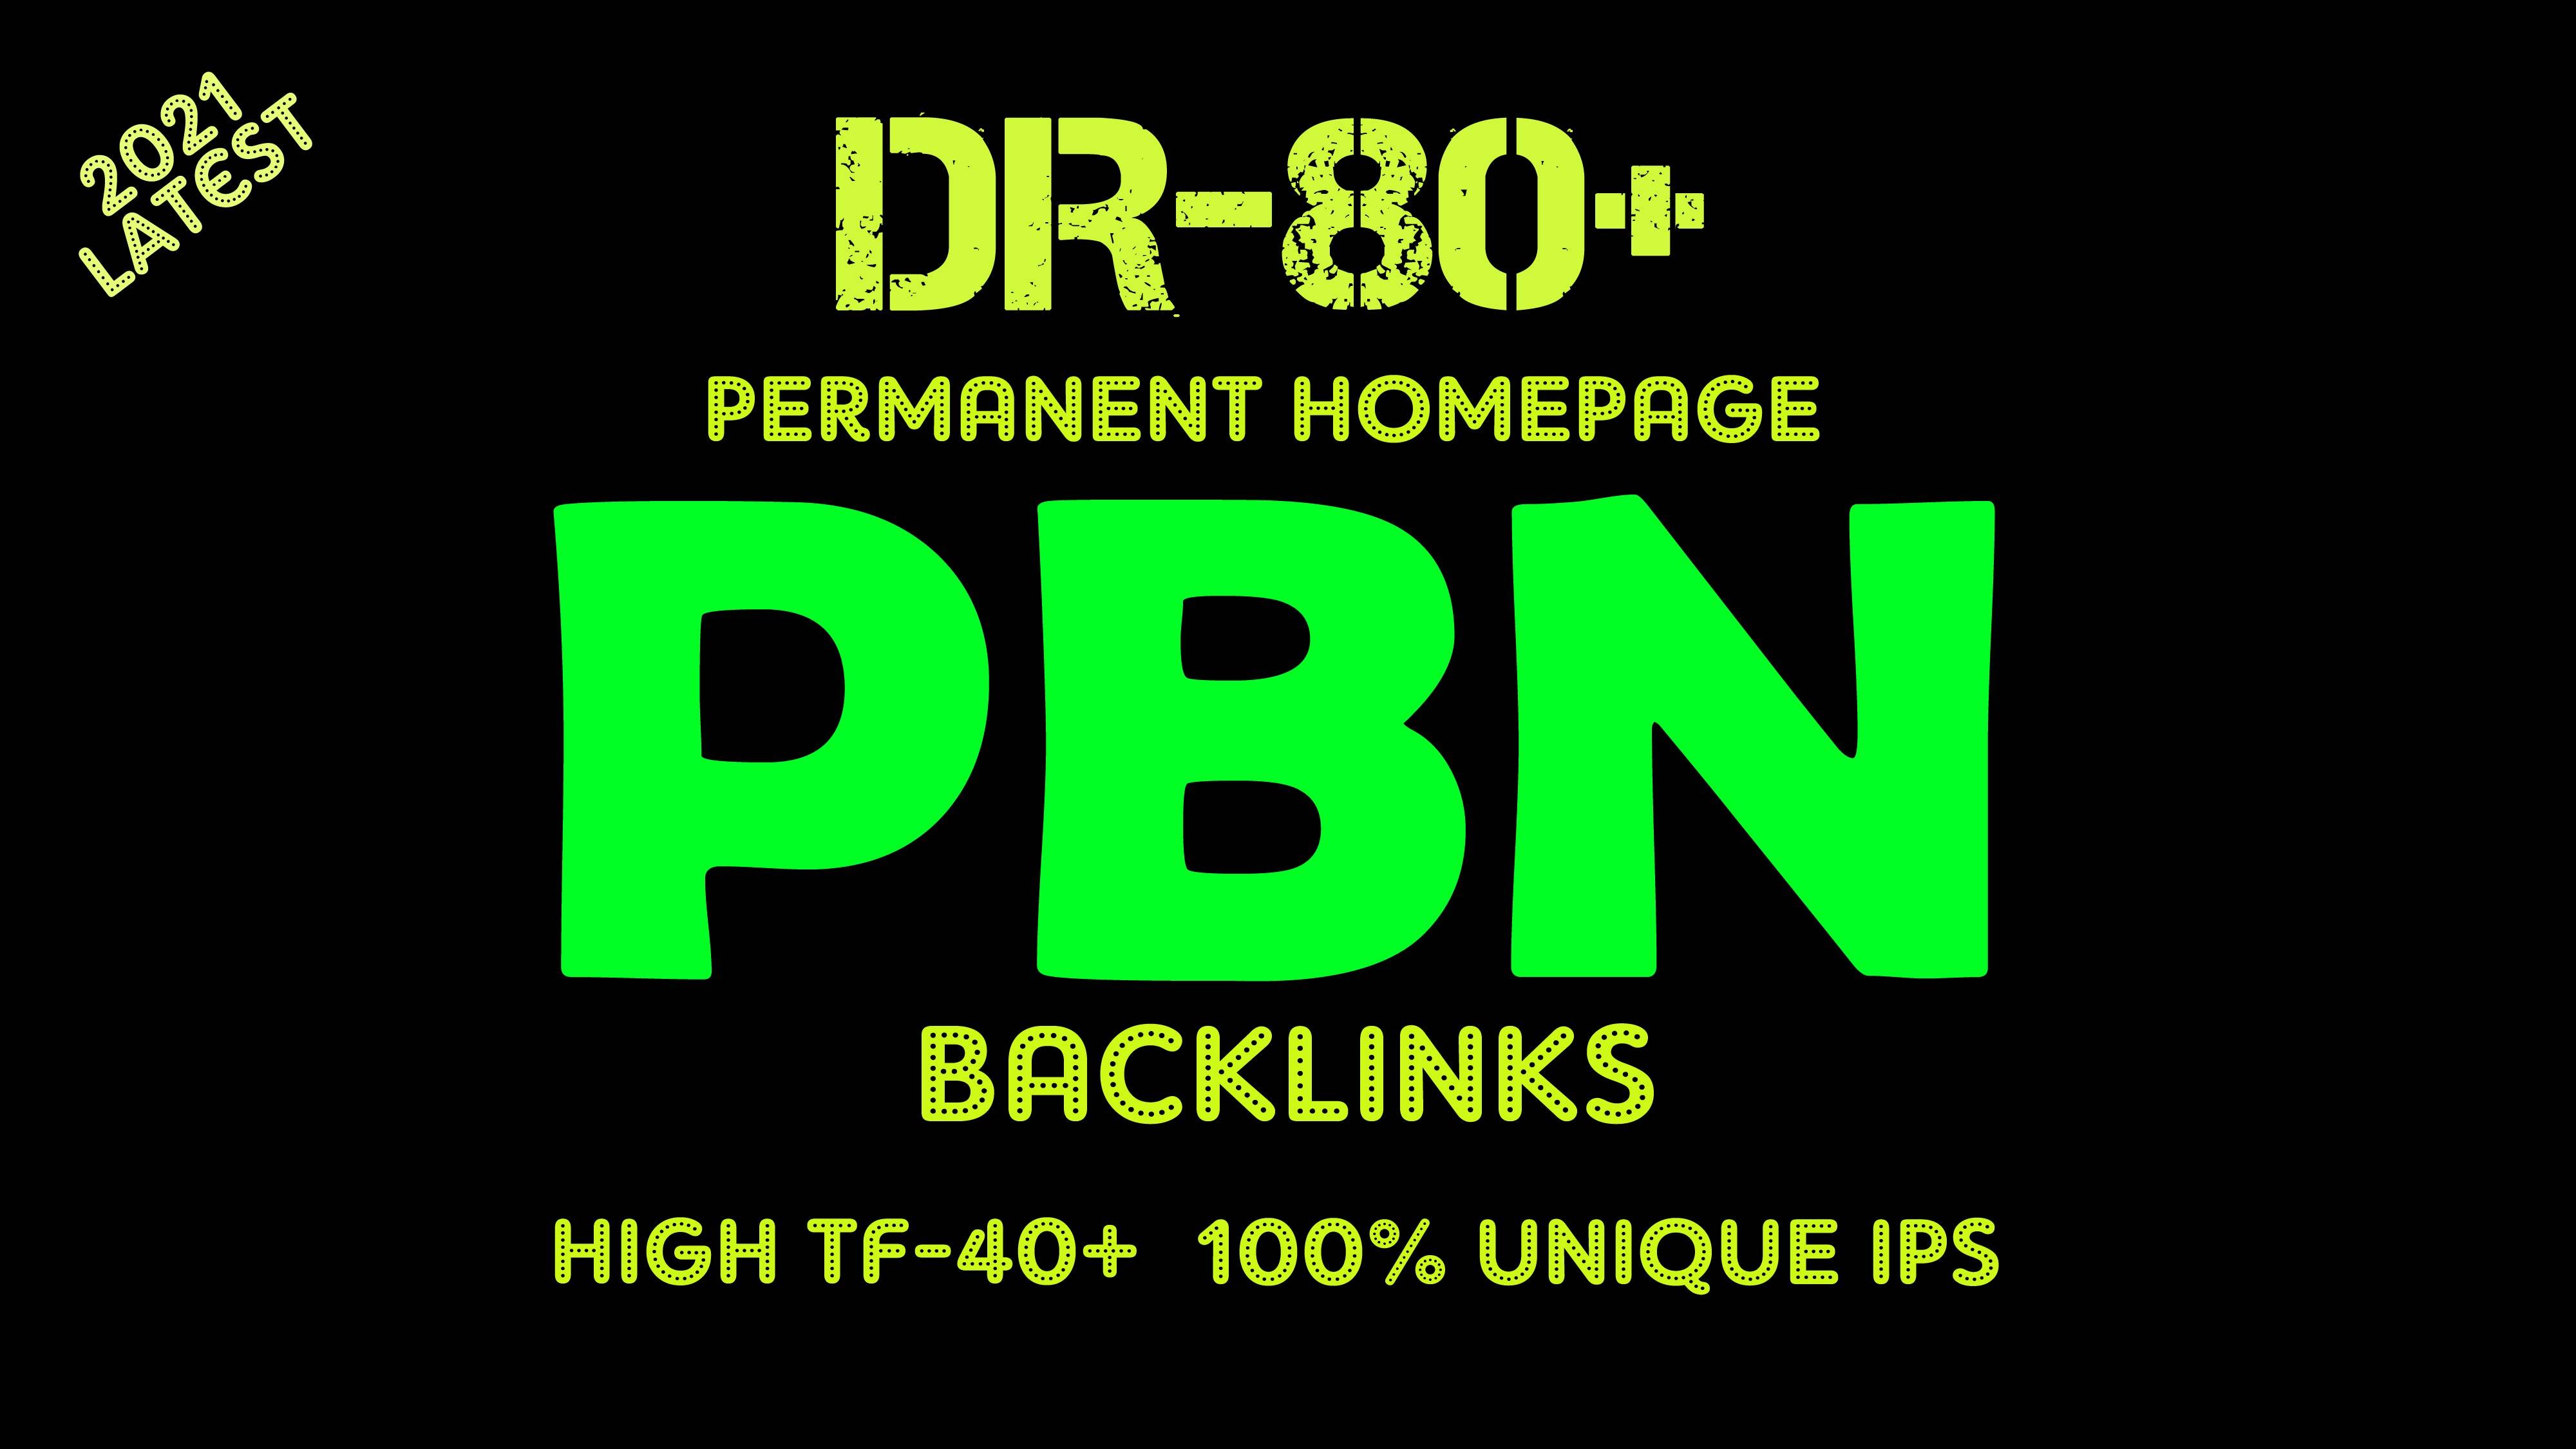 Build high quality da pa tf DR-80 homepage backlinks